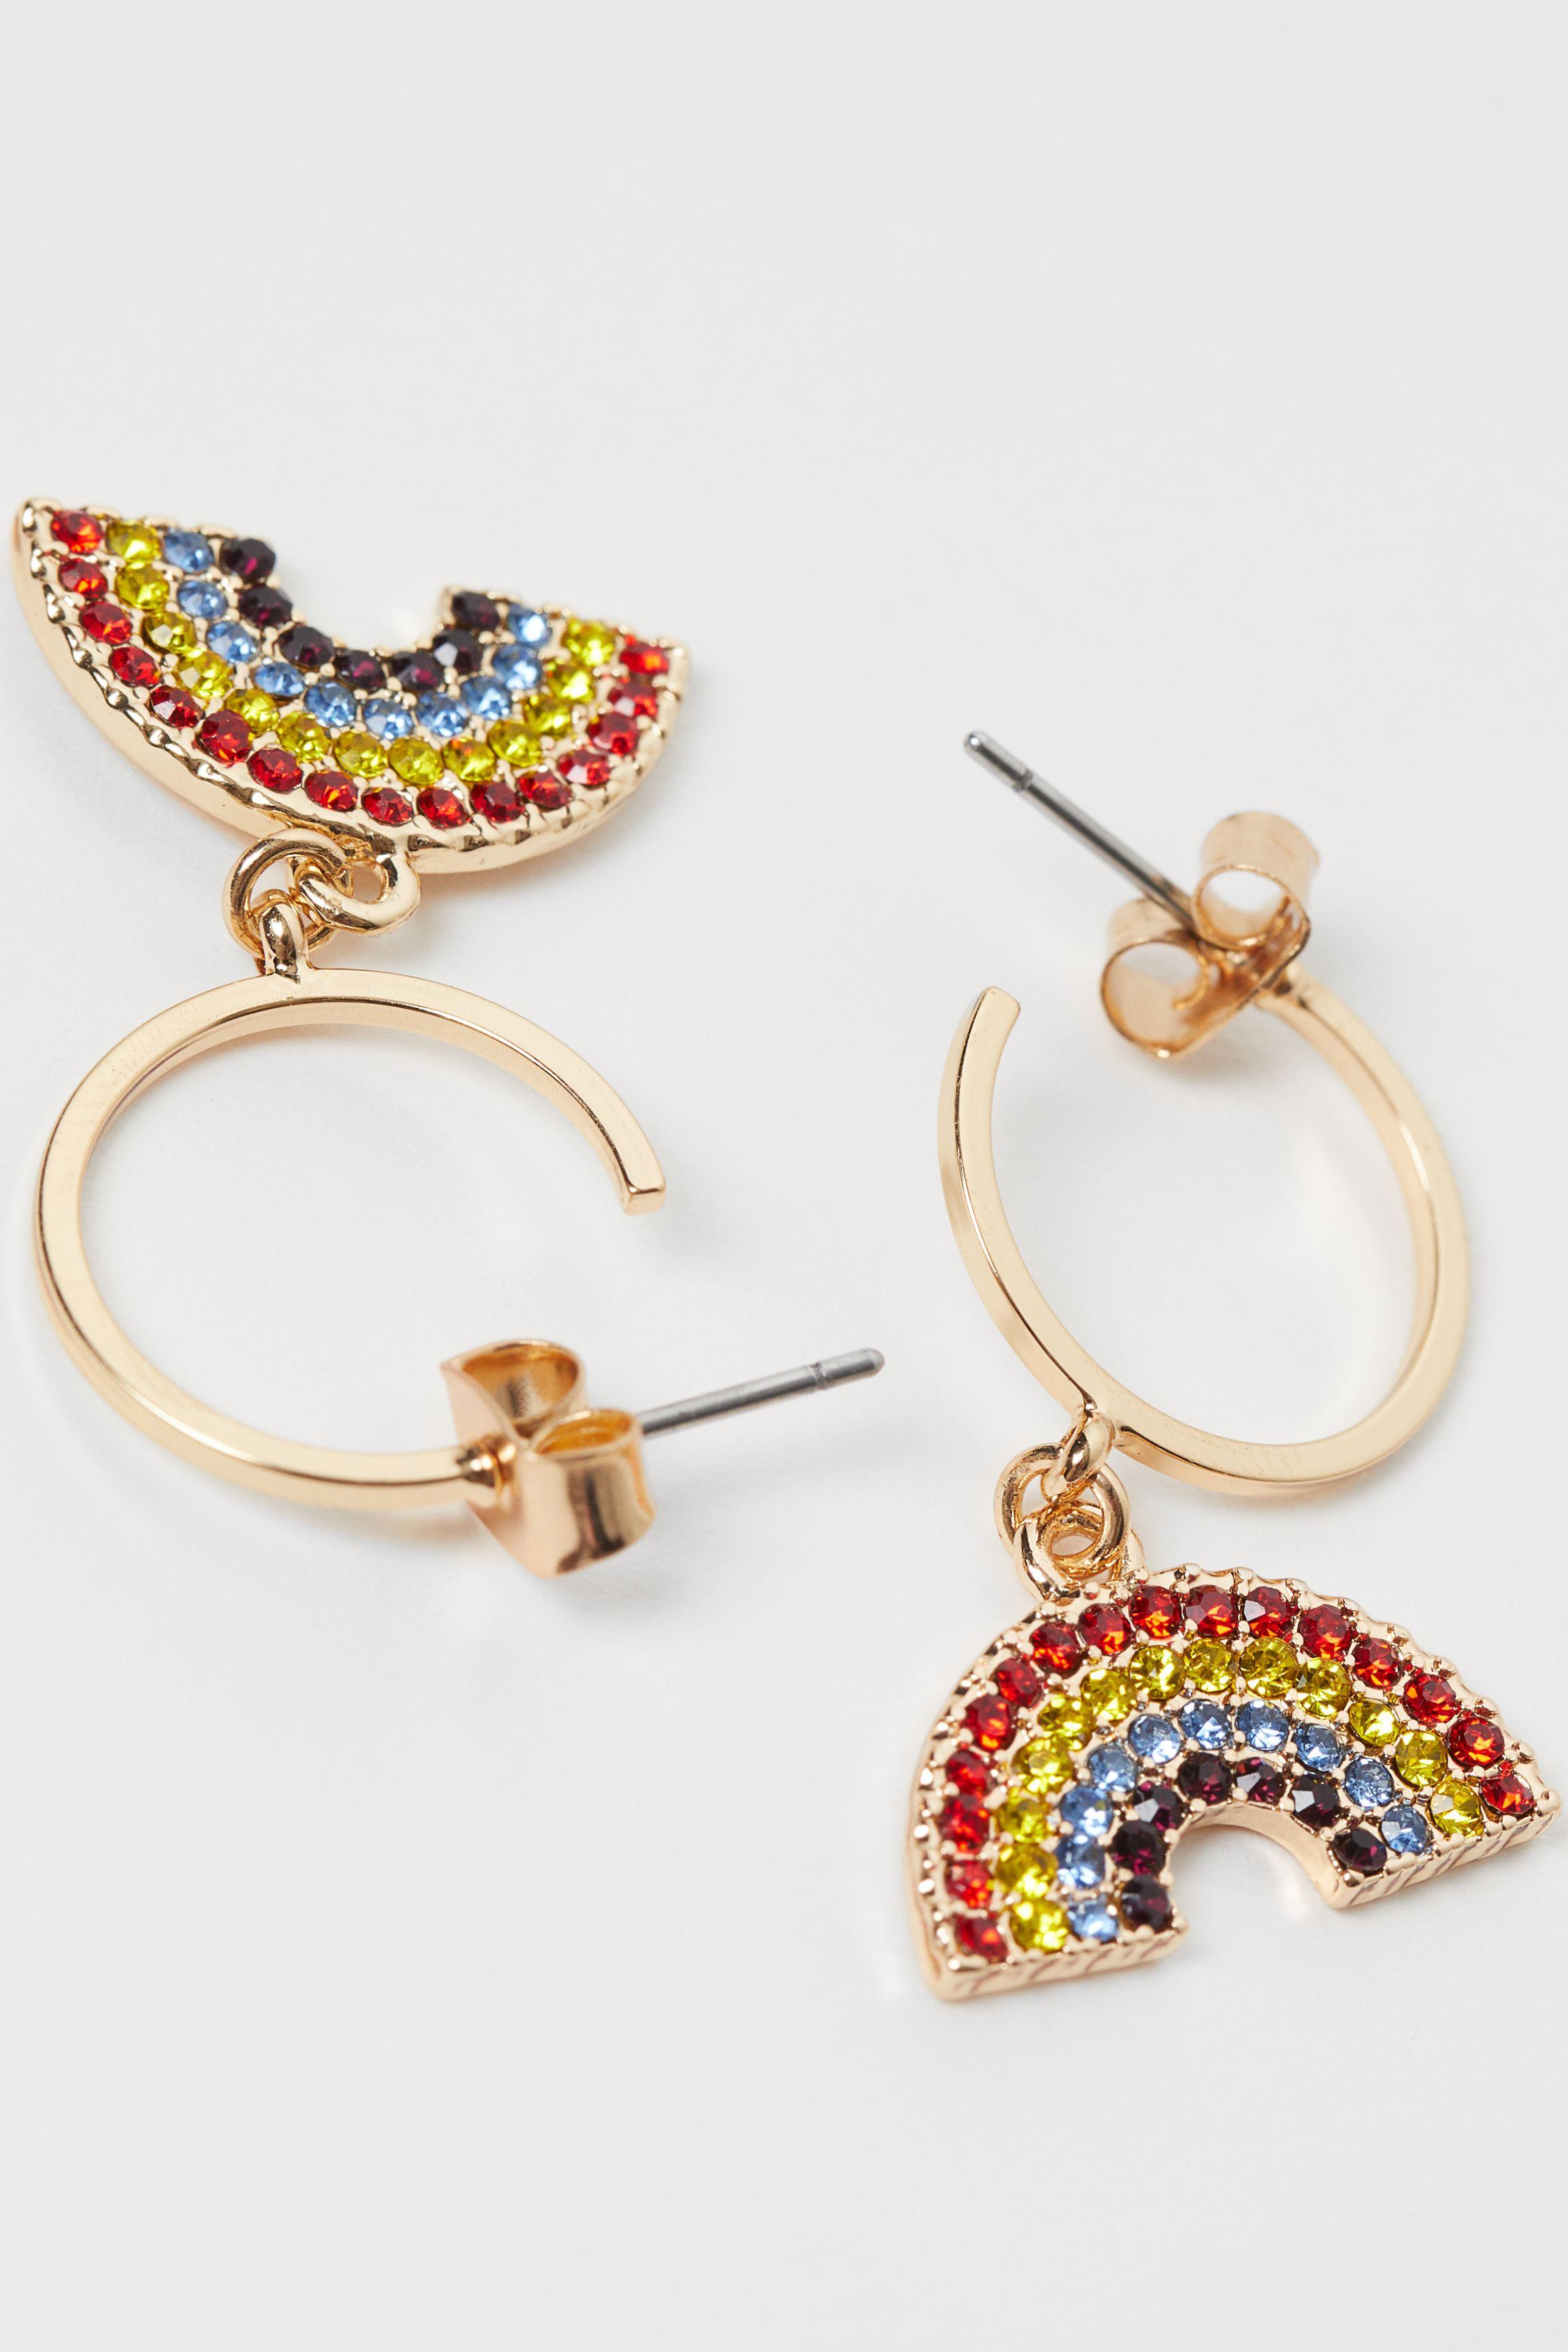 Rhinestone-decorated Earrings